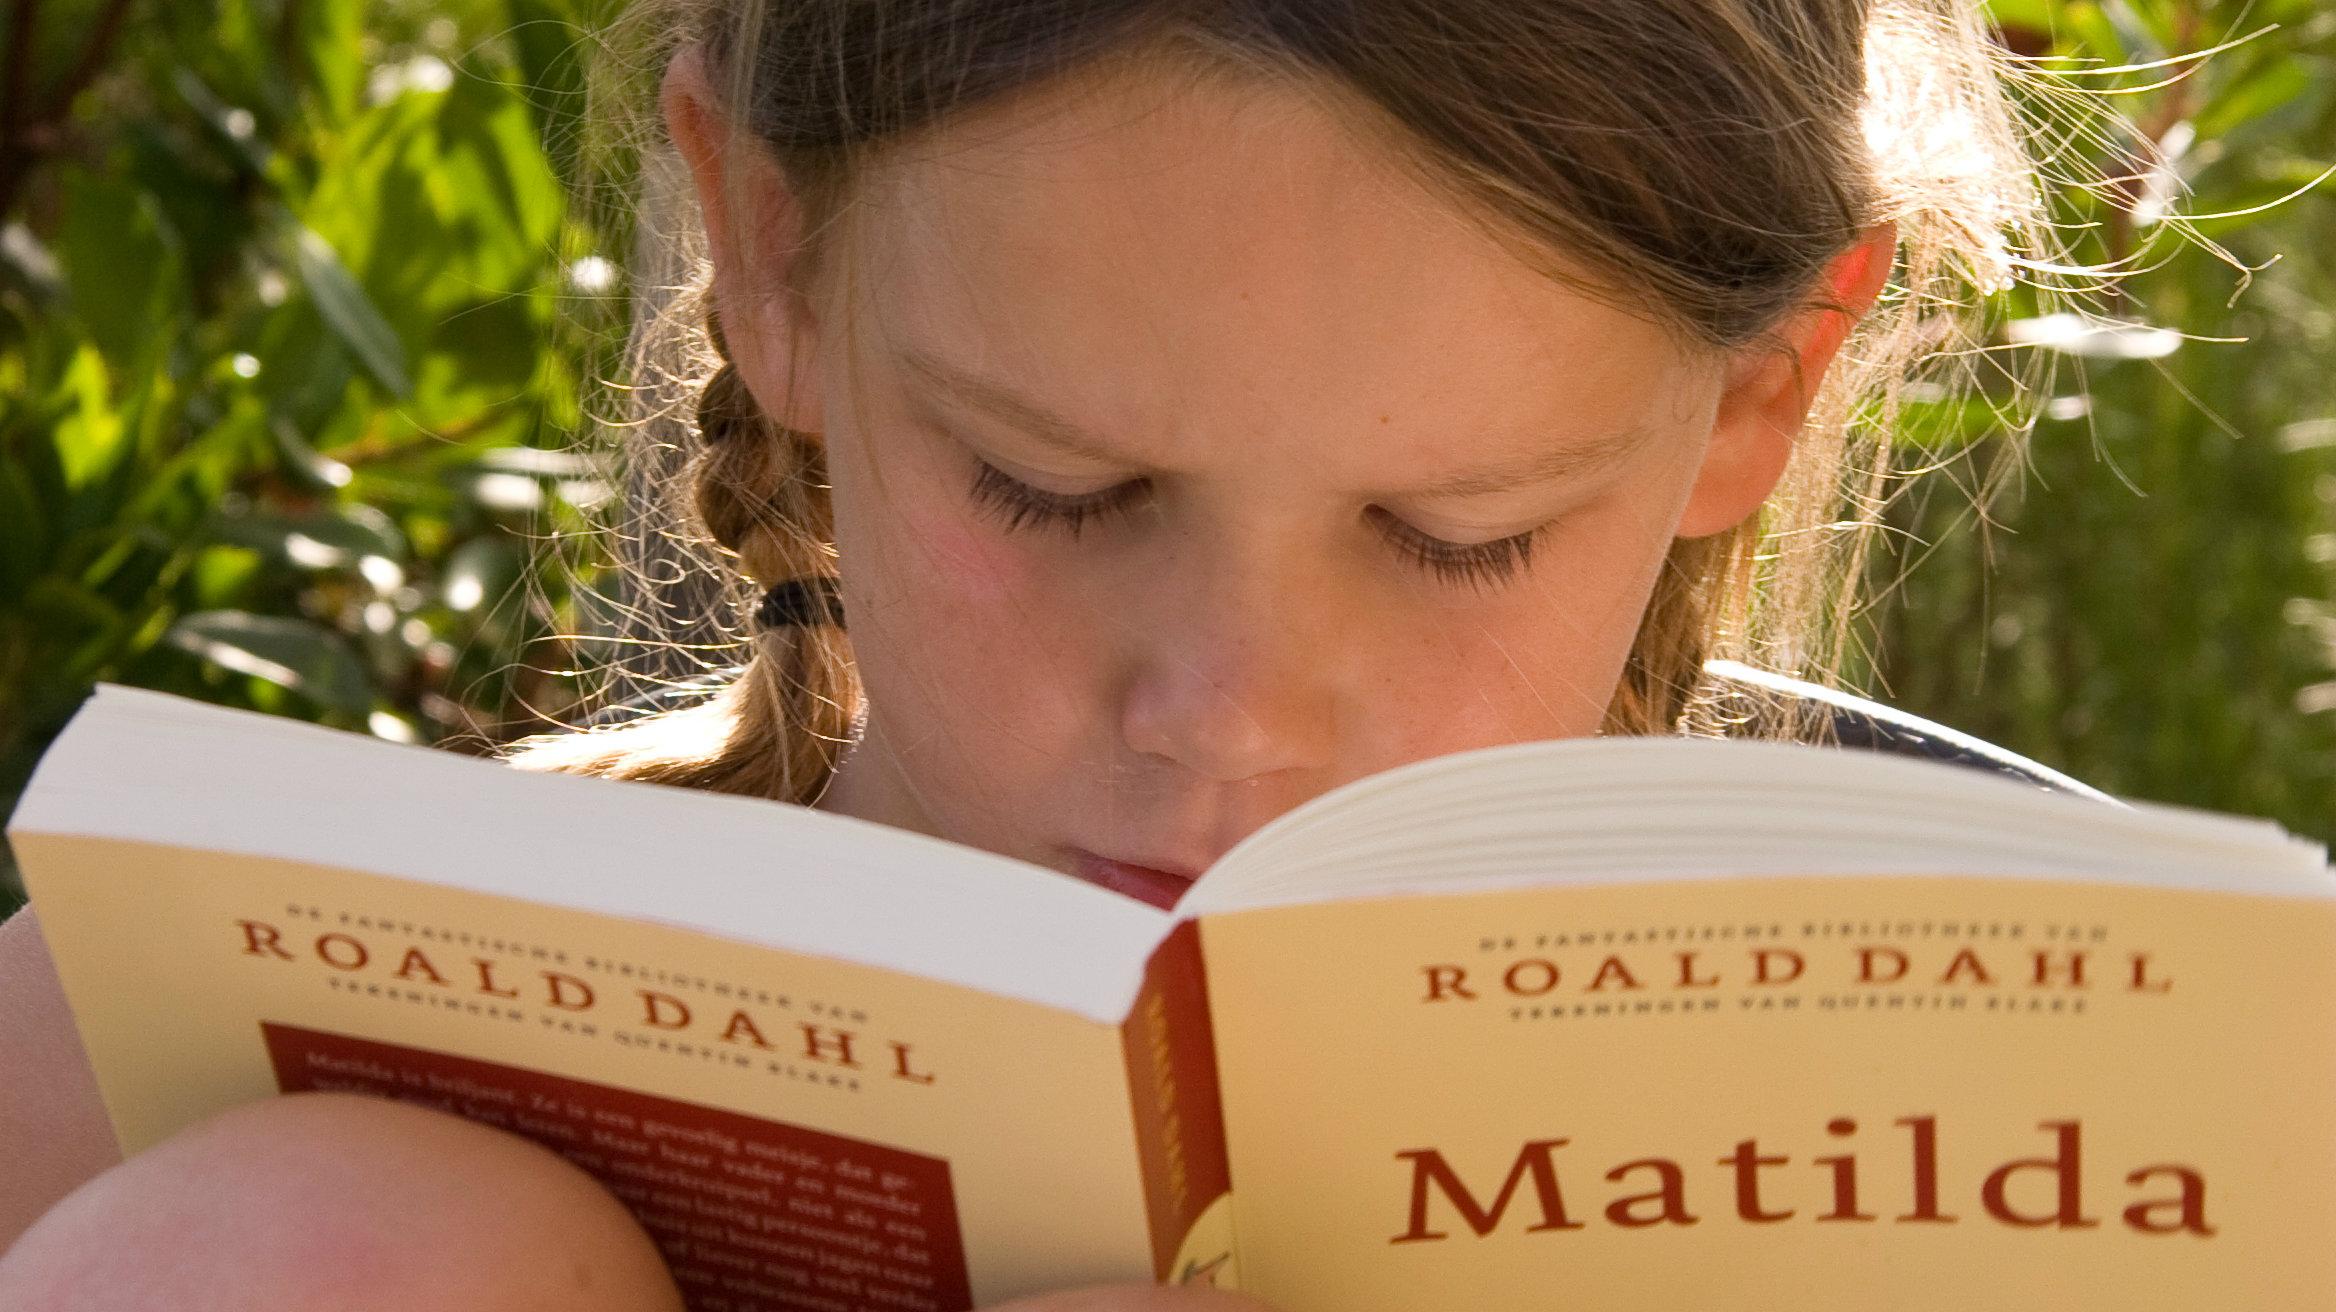 roald-dahl-matilda-reading